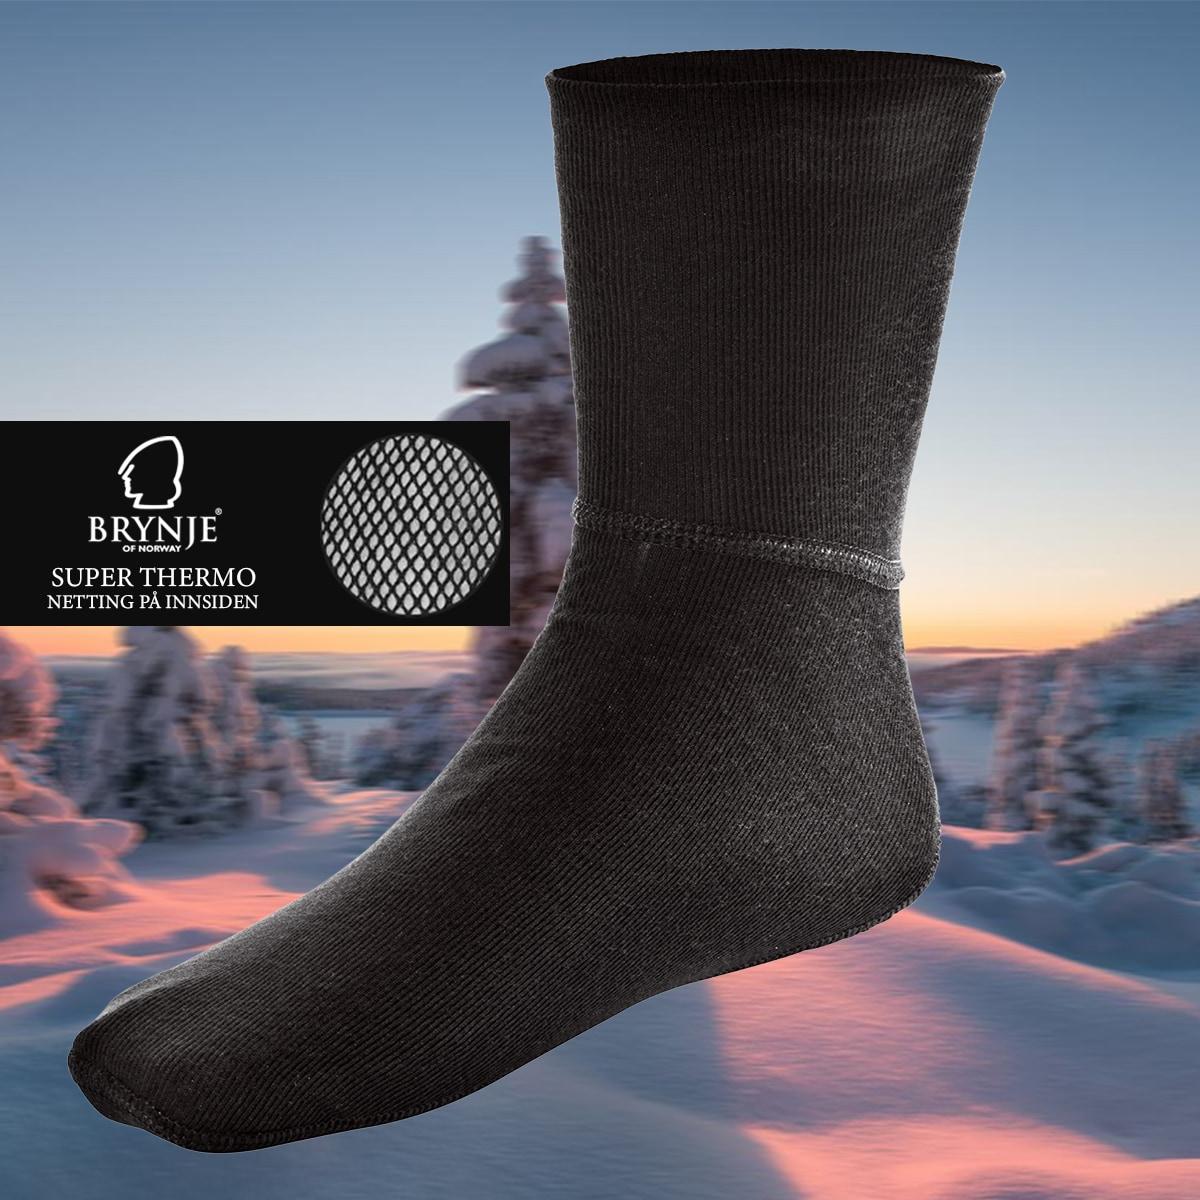 Brynje Super Thermo sock w/net lining